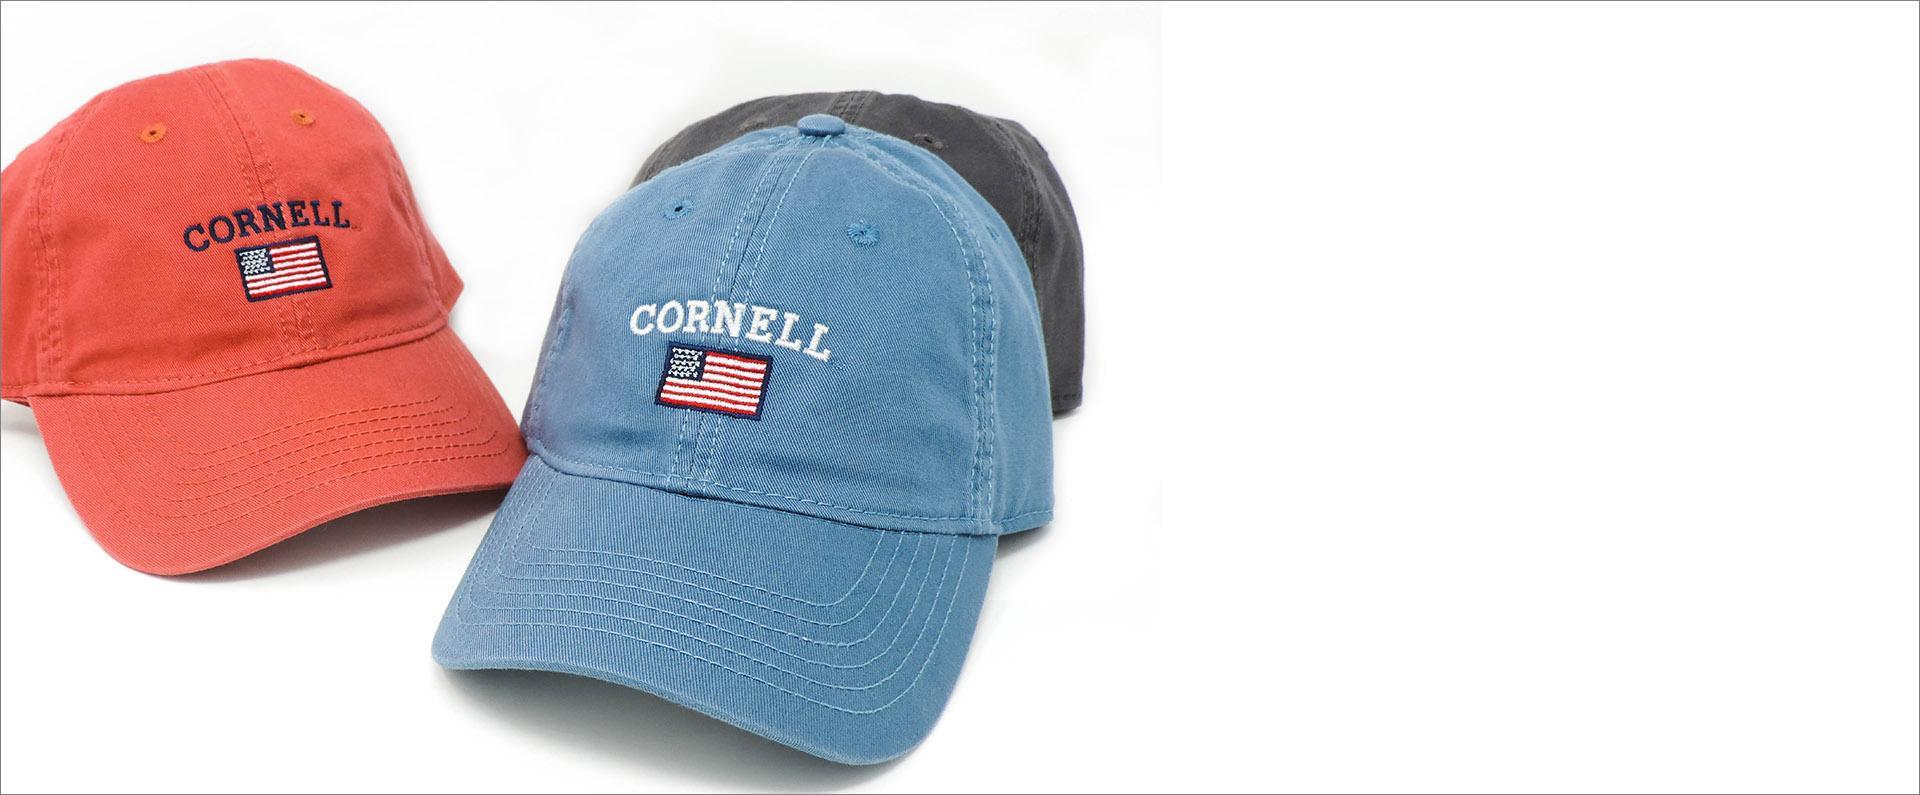 2ce666329454d Timeless Cornell Caps